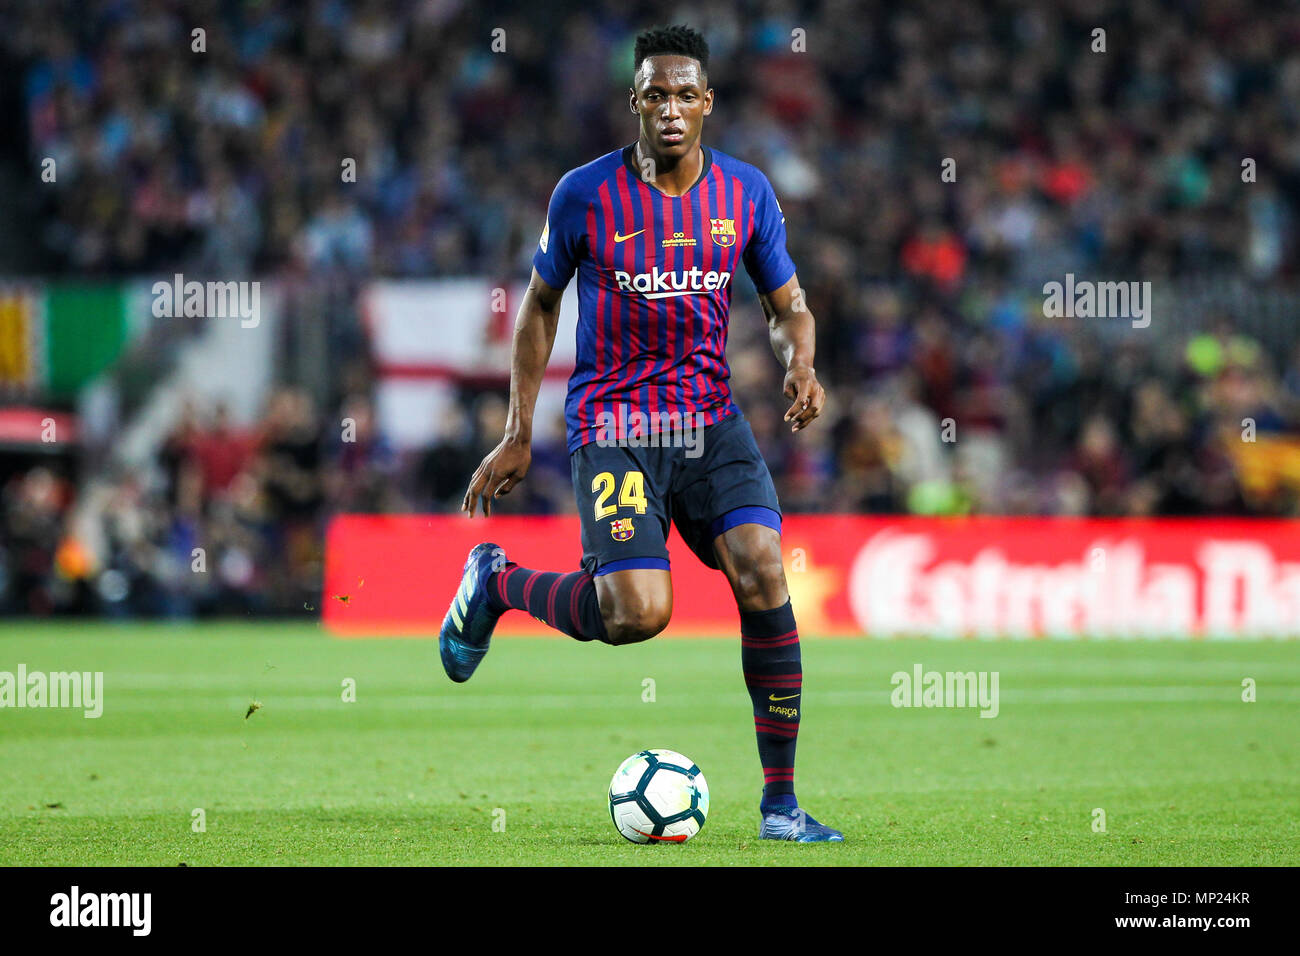 Camp Nou Barcelona Spain 20th May 2018 La Liga Football Barcelona Versus Real Sociedad Yerry Mina Of Fc Barcelona With The Ball Credit Action Plus Sports Alamy Live News Stock Photo Alamy